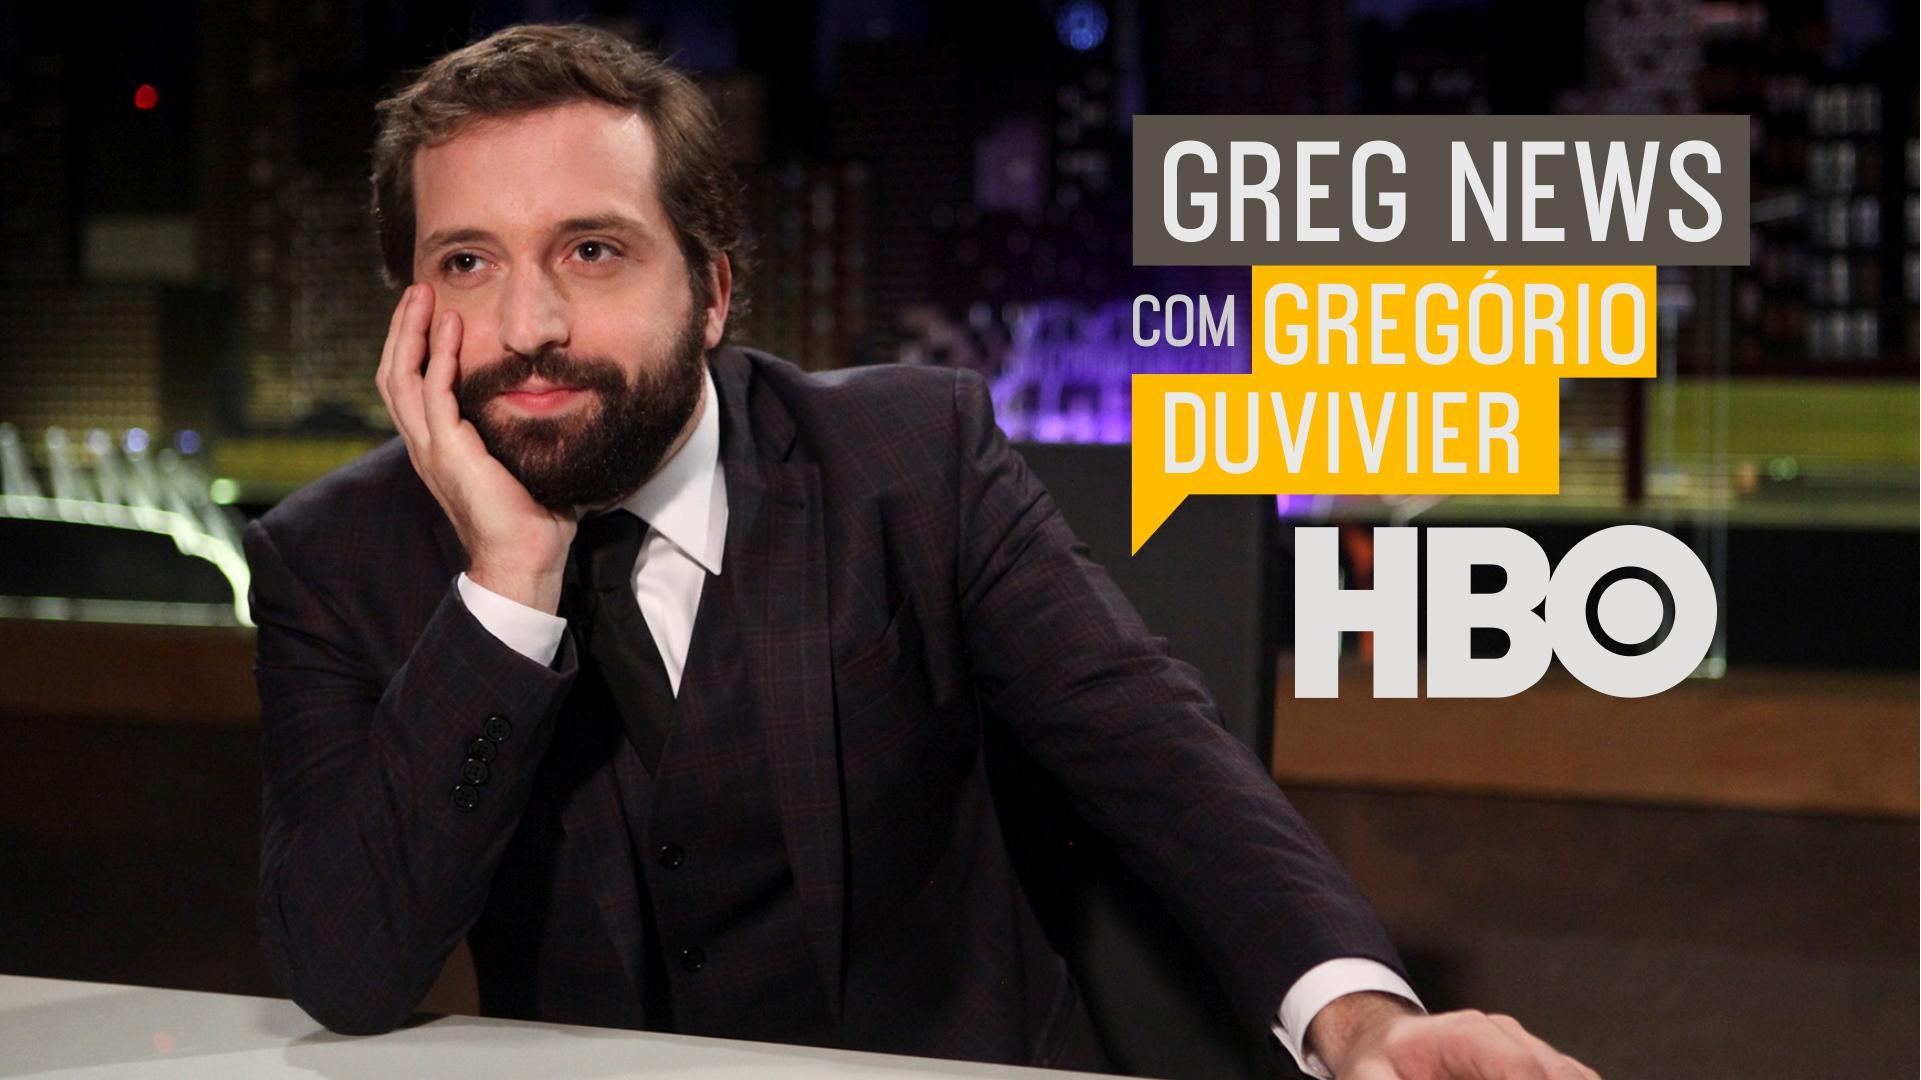 net-brasilia-nova-temporada-greg-news